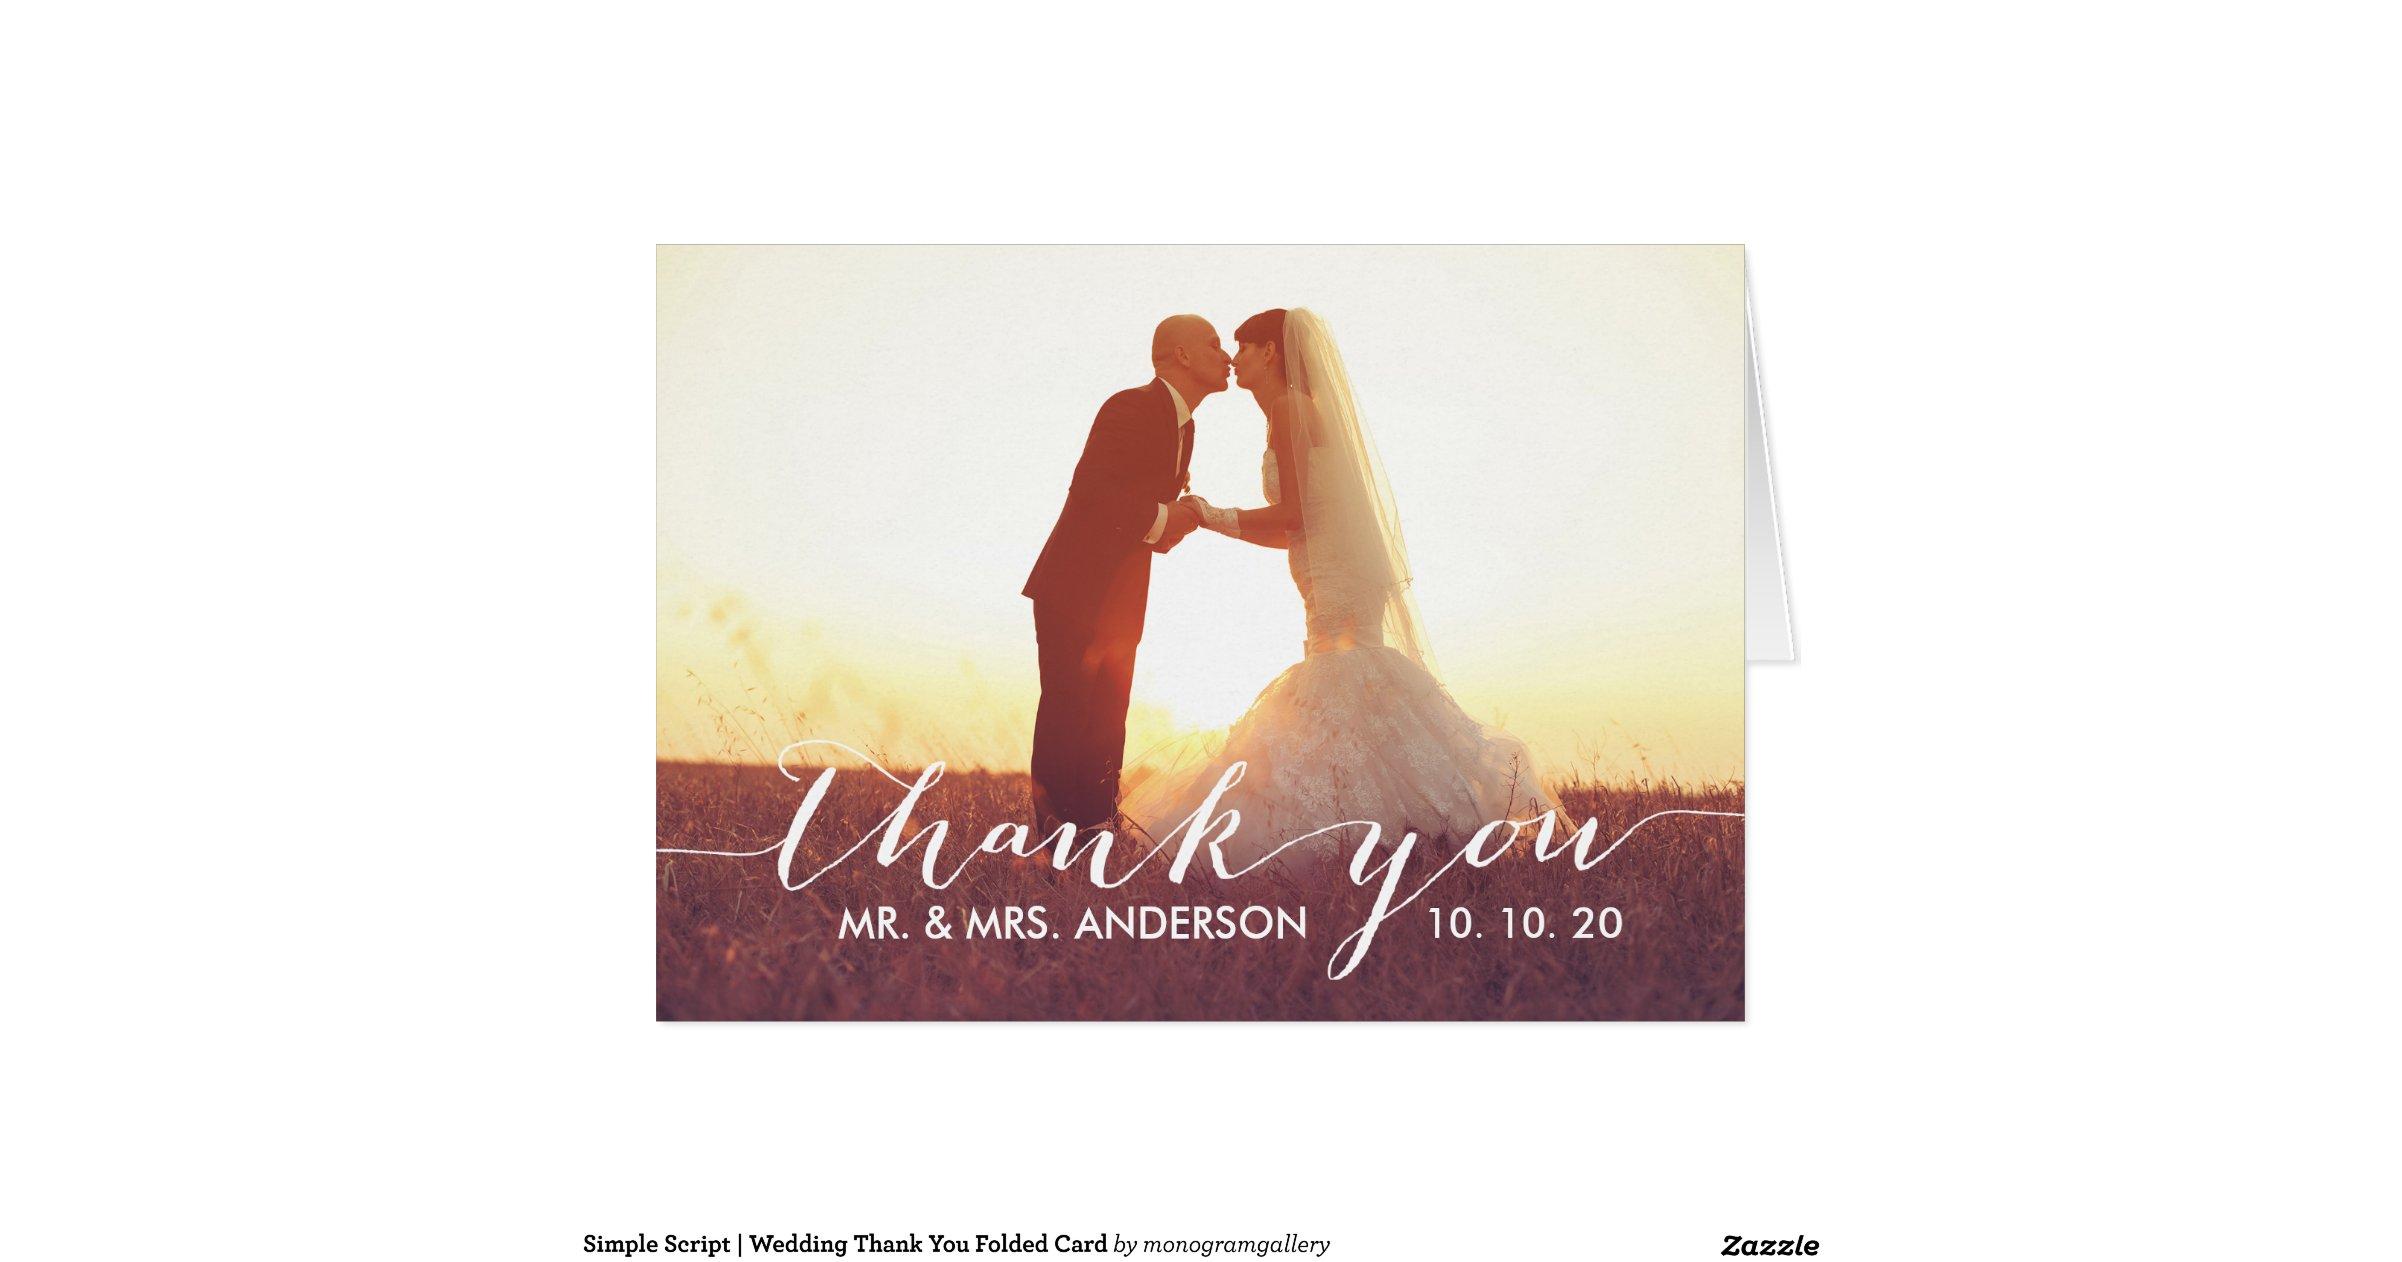 simple script wedding thank you folded card re1462555017b44e1a861c7127e7b221d xvua8 8byvr 1200